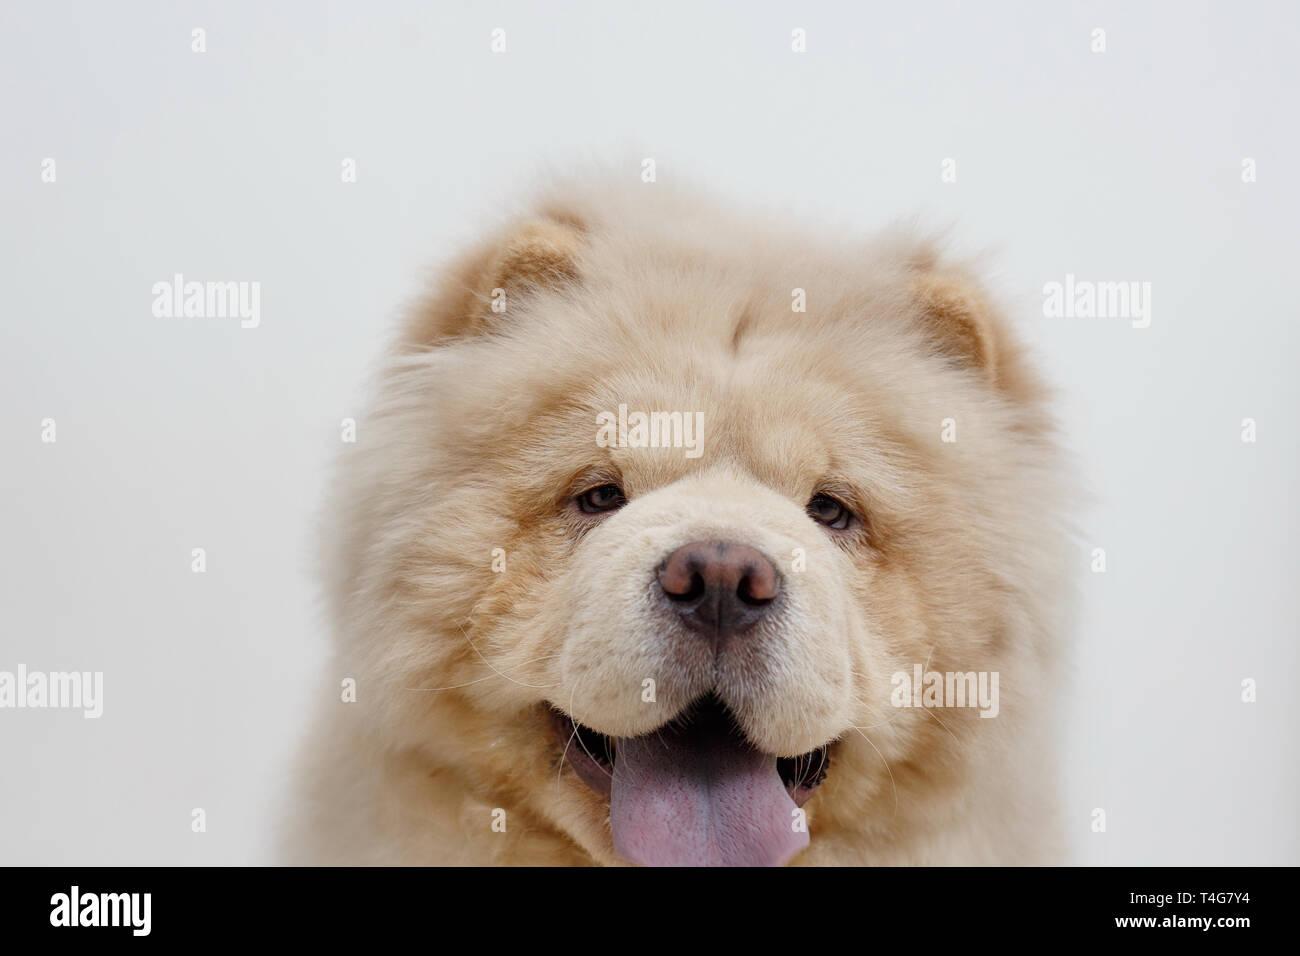 Puffy Lion Dog Stock Photos & Puffy Lion Dog Stock Images